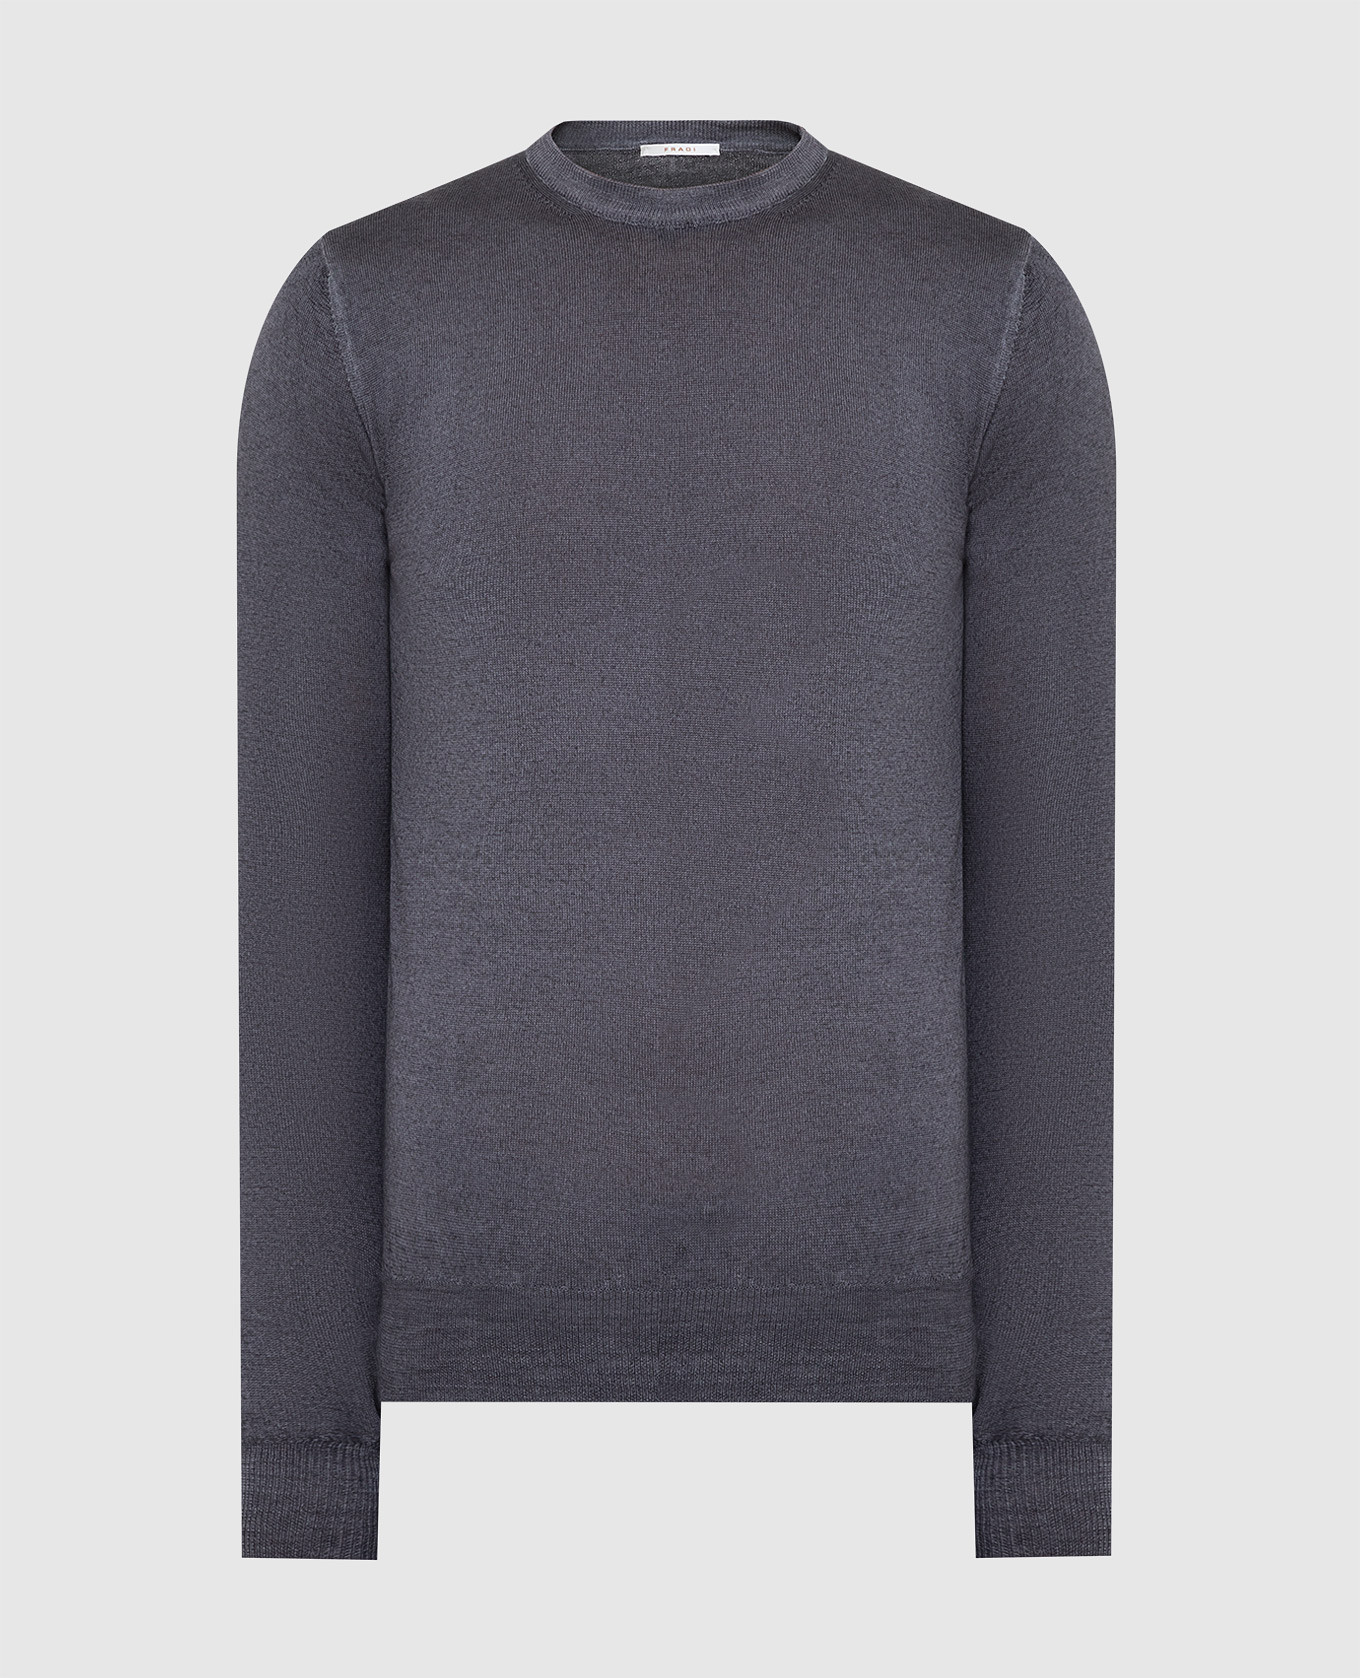 Темно-серый джемпер из шерсти